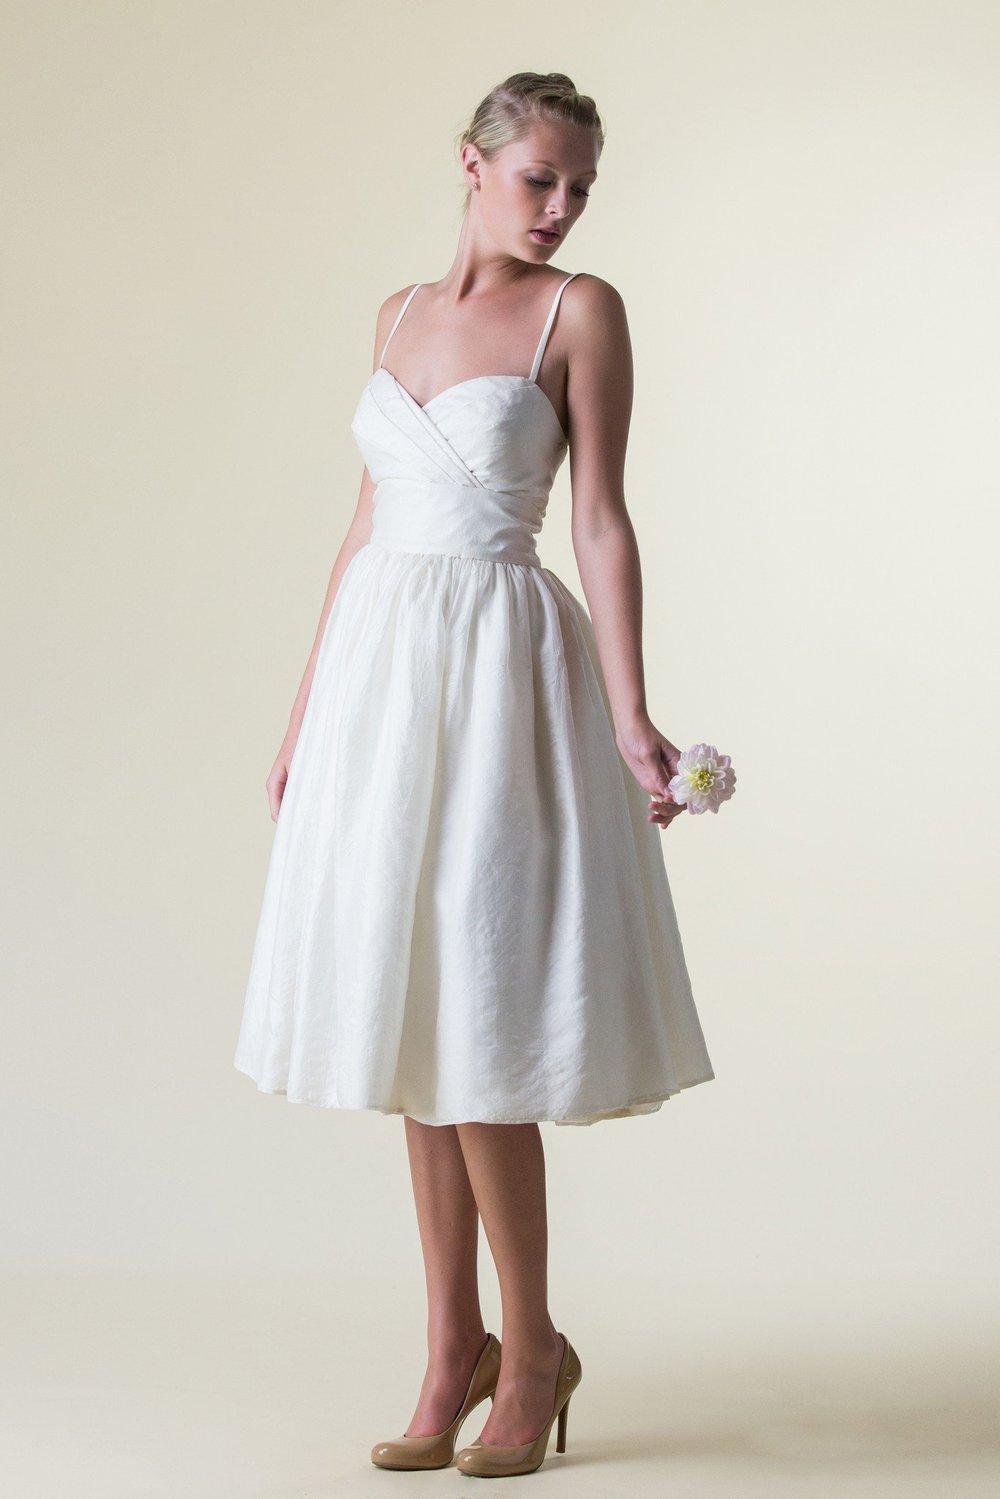 fair-trade-wedding-dress